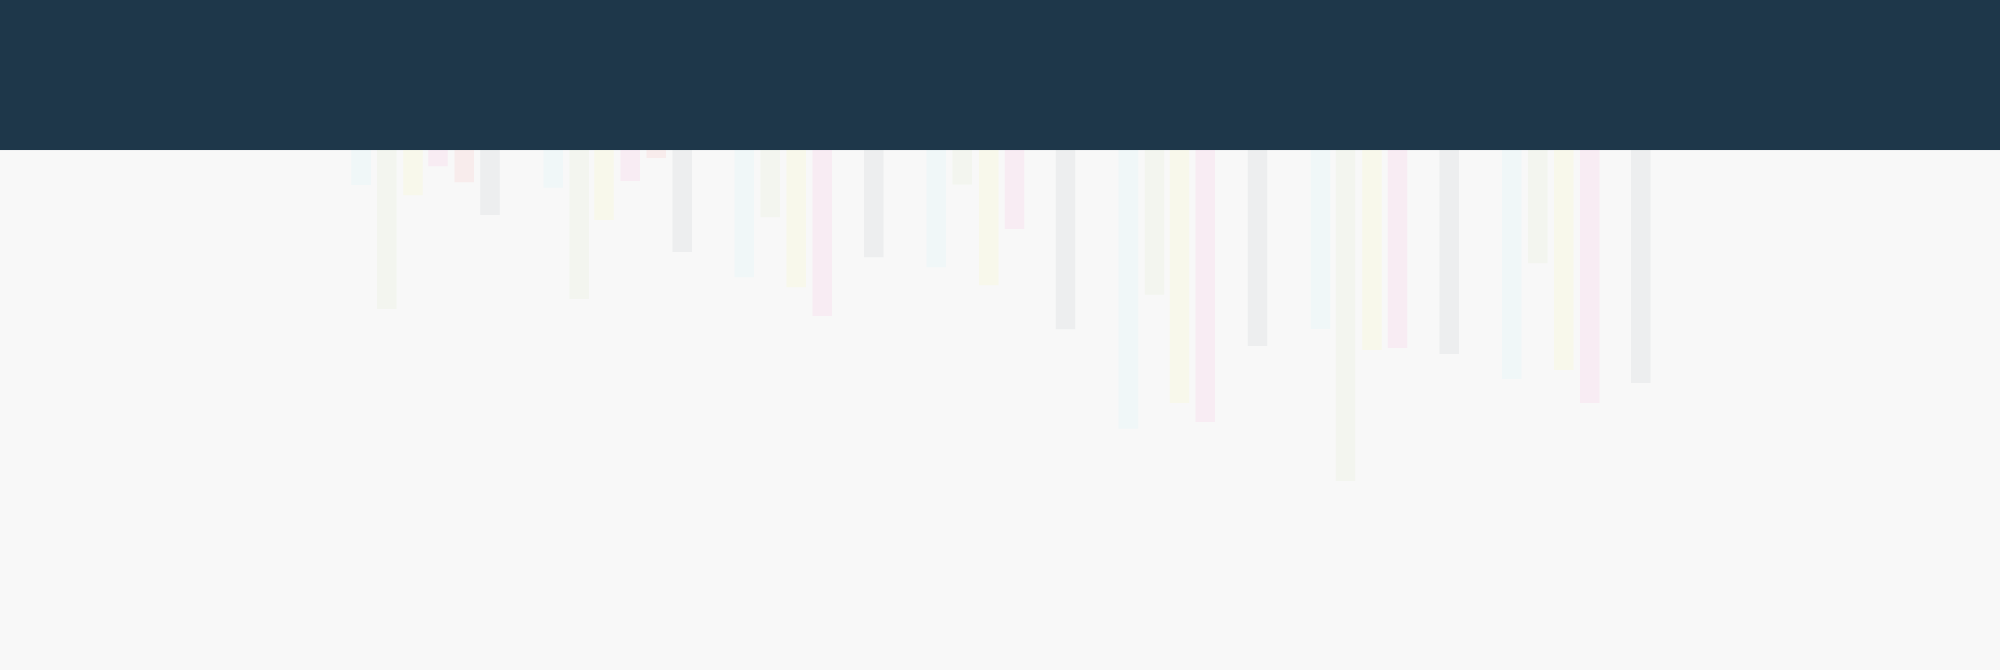 Homepage hero image qbase+ target bar chart